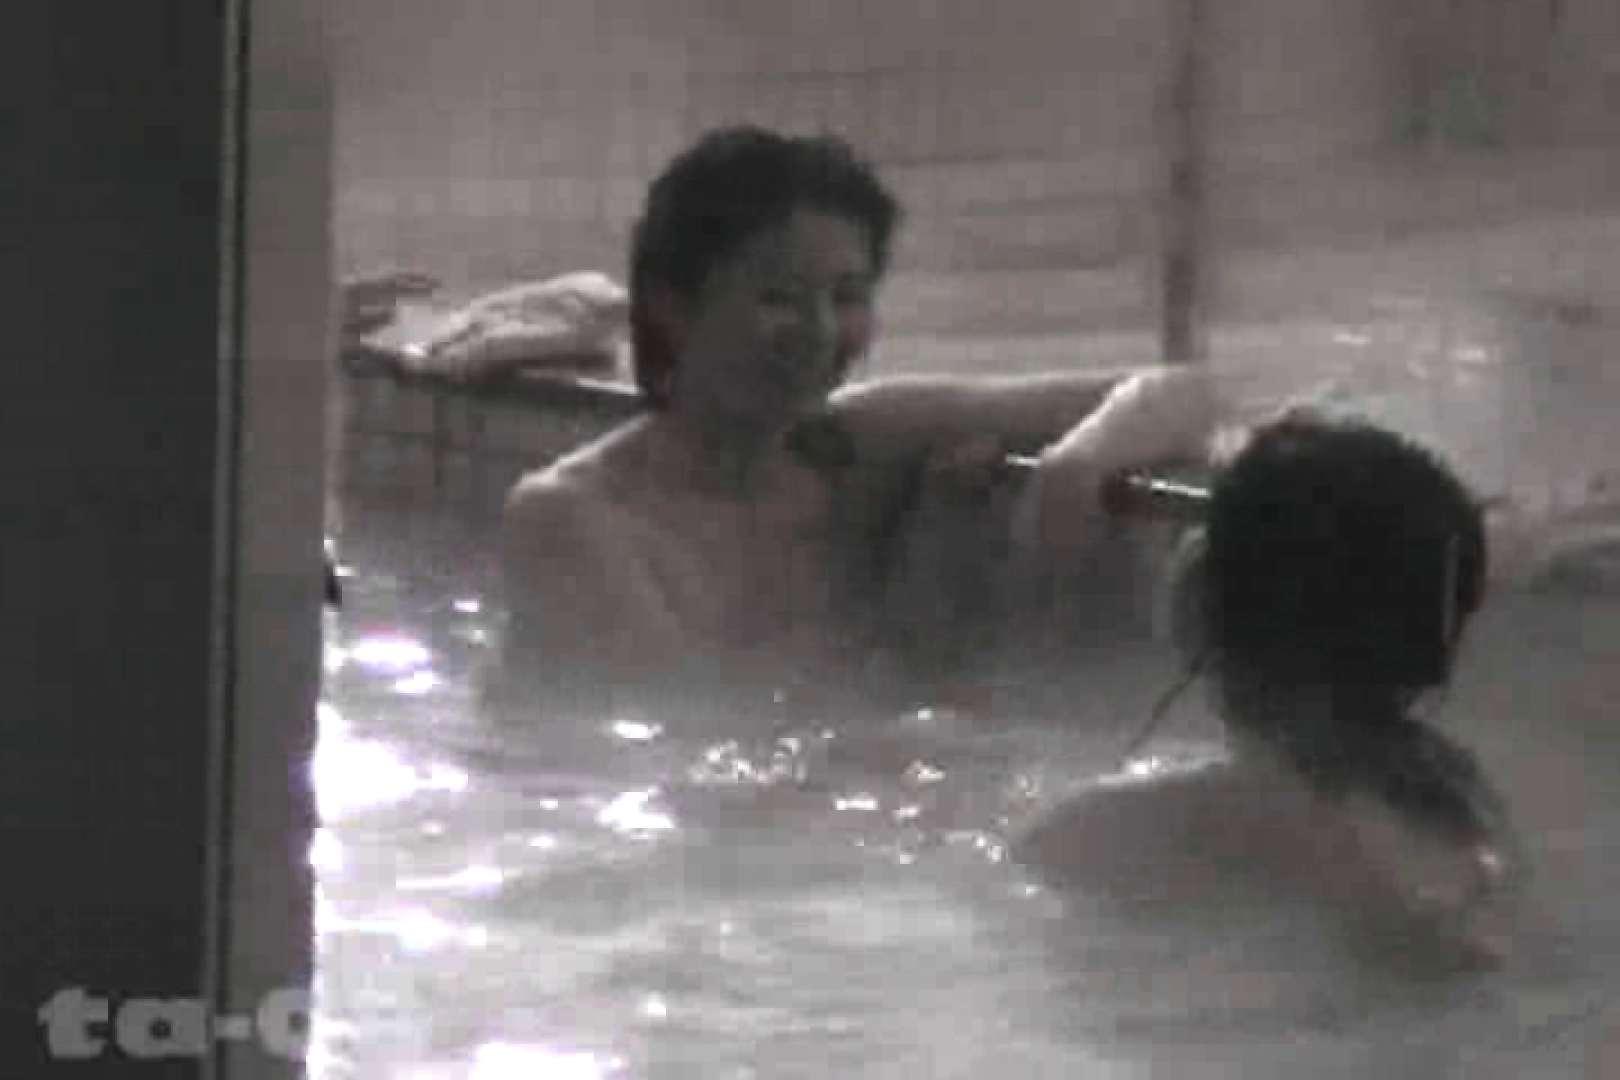 合宿ホテル女風呂盗撮高画質版 Vol.08 高画質  52PIX 14